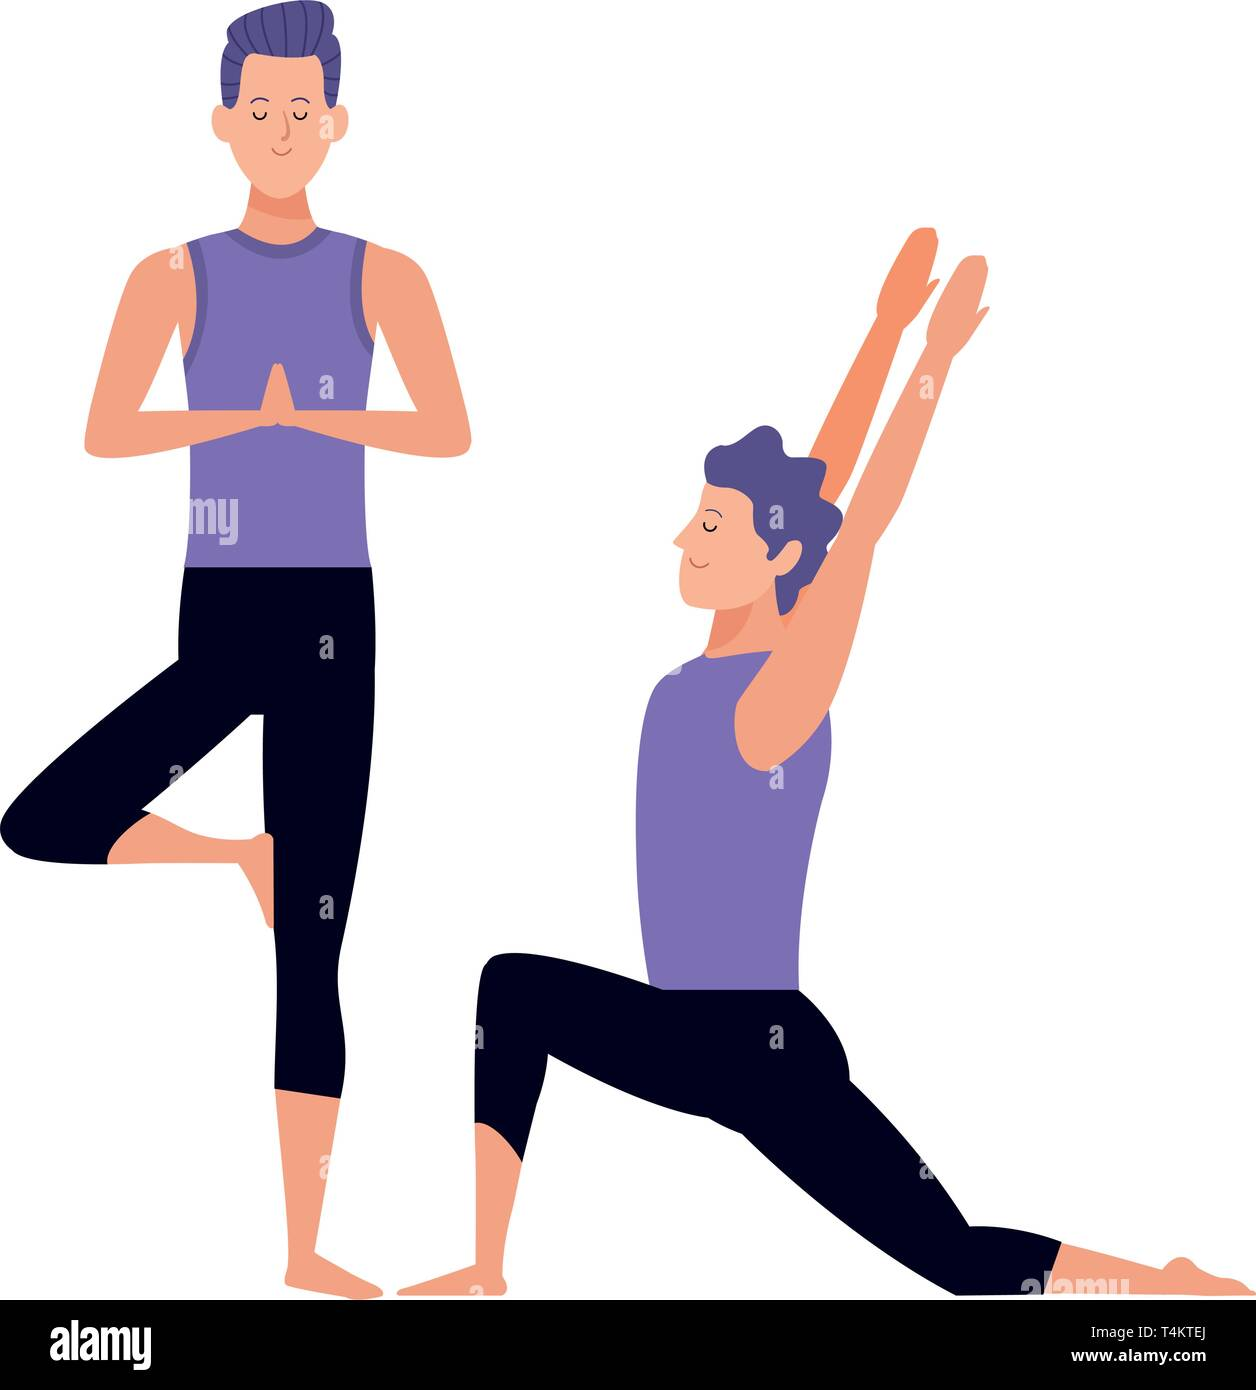 Men Yoga Poses Stock Vector Image Art Alamy